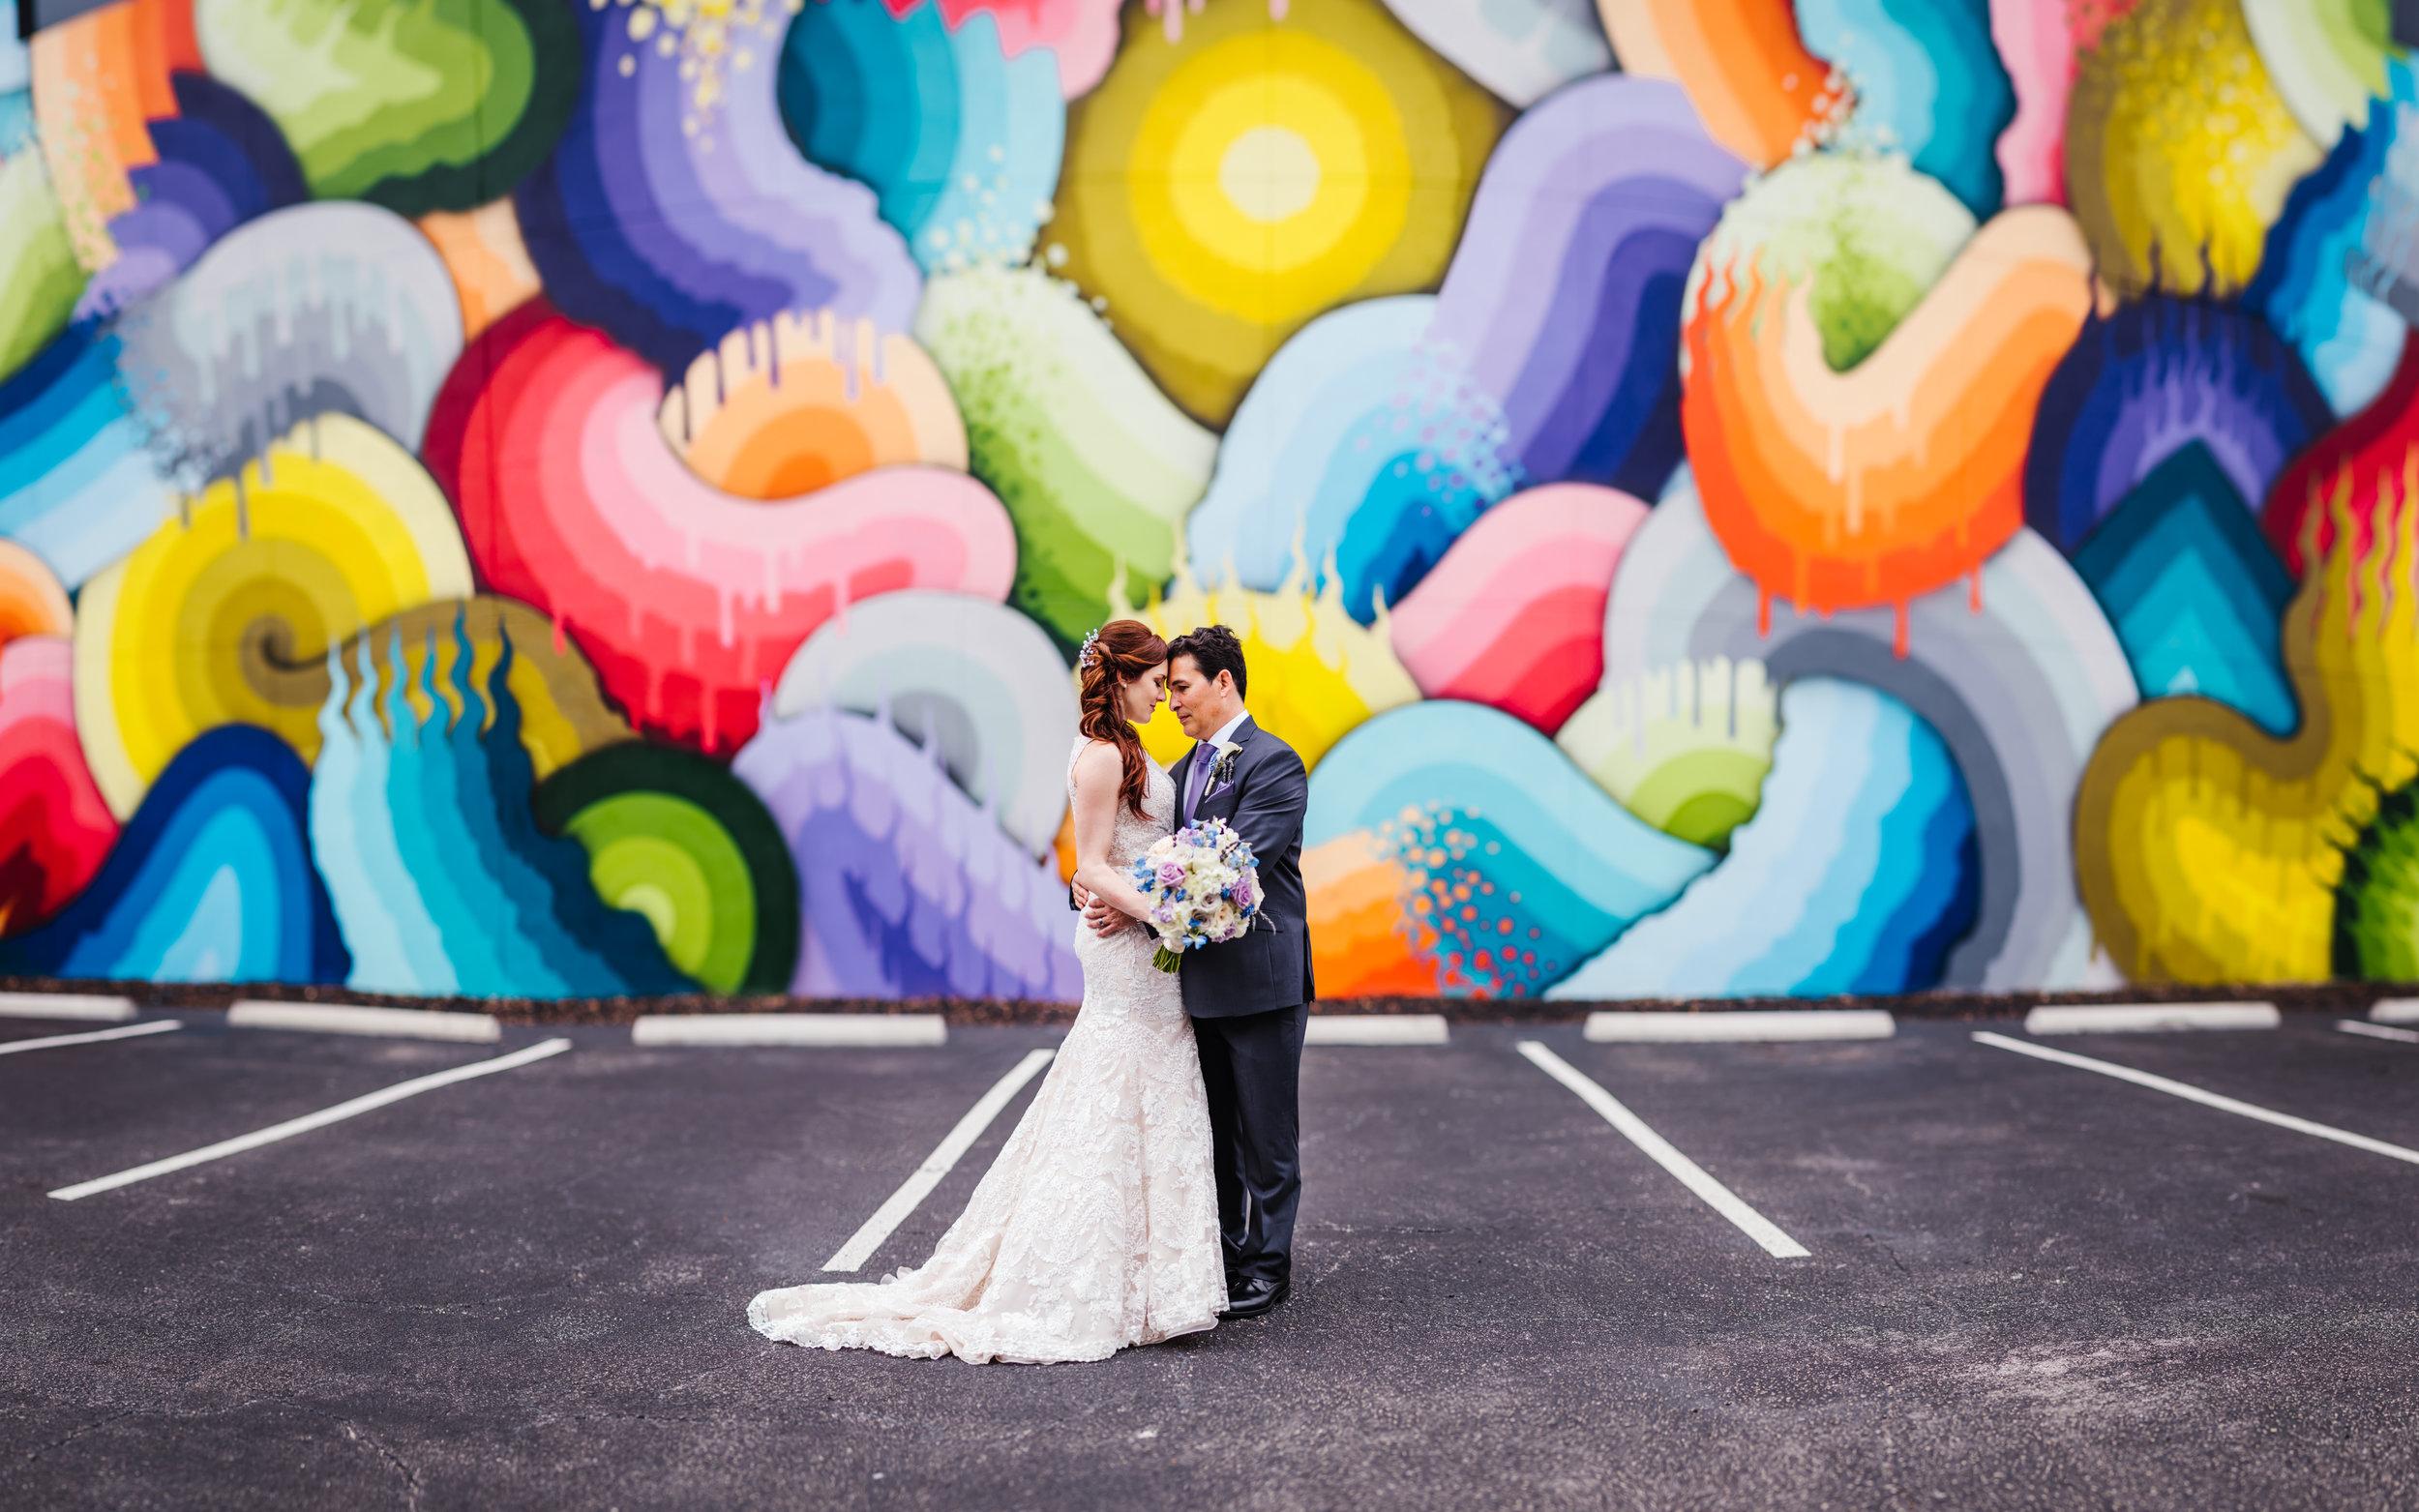 Wedding-Photographer- St-Pete-Mural-Bright-Fun.jpg